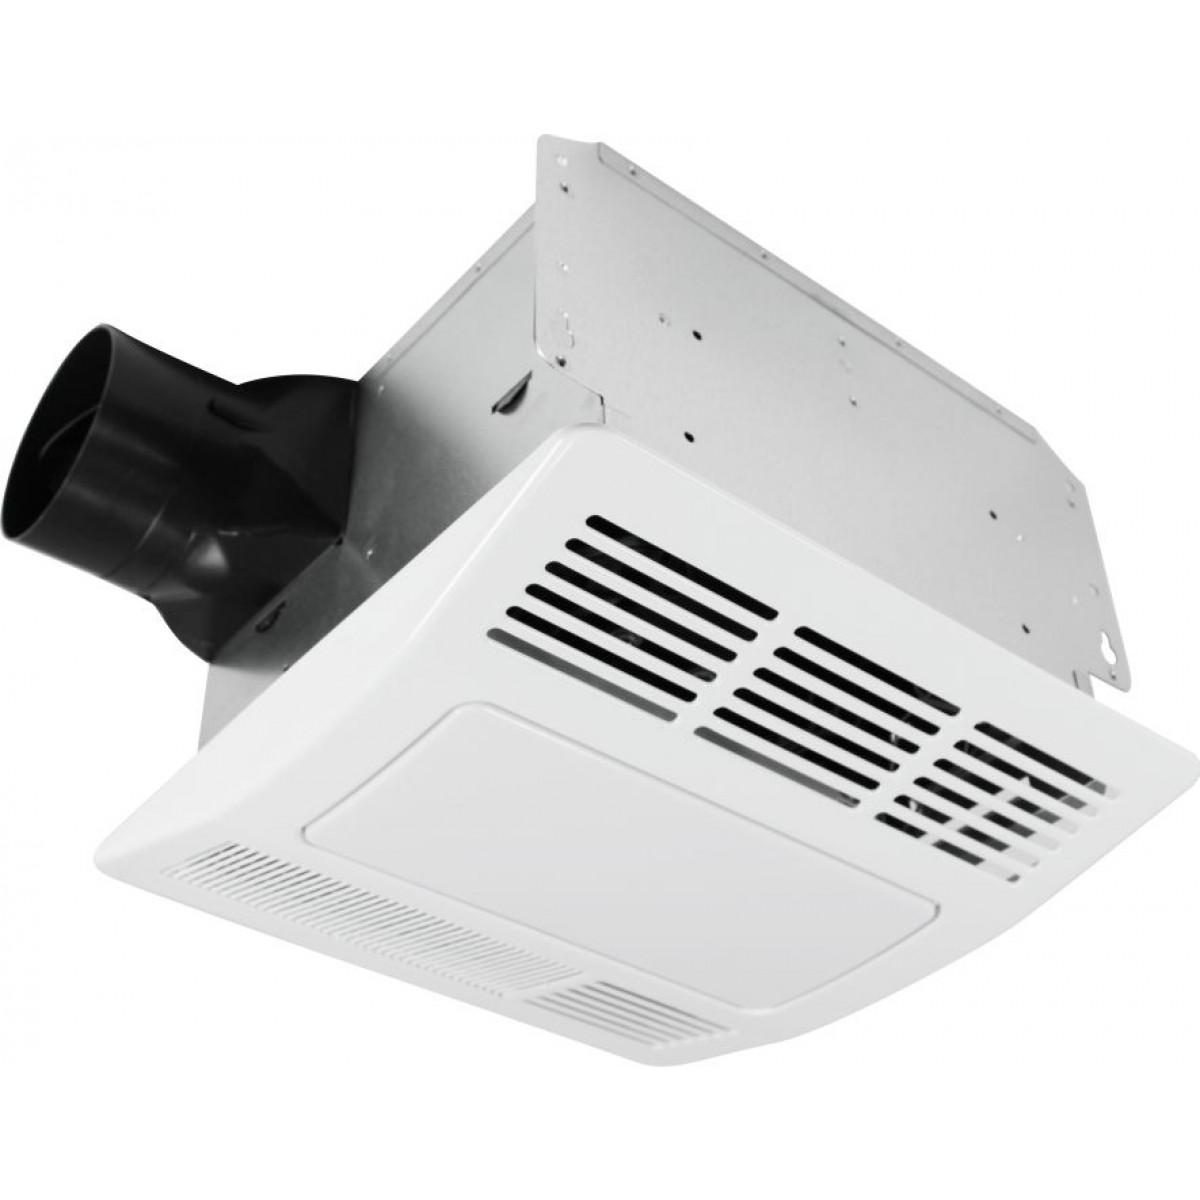 odhfl110 deluxe heat fanlight individual fans. Black Bedroom Furniture Sets. Home Design Ideas